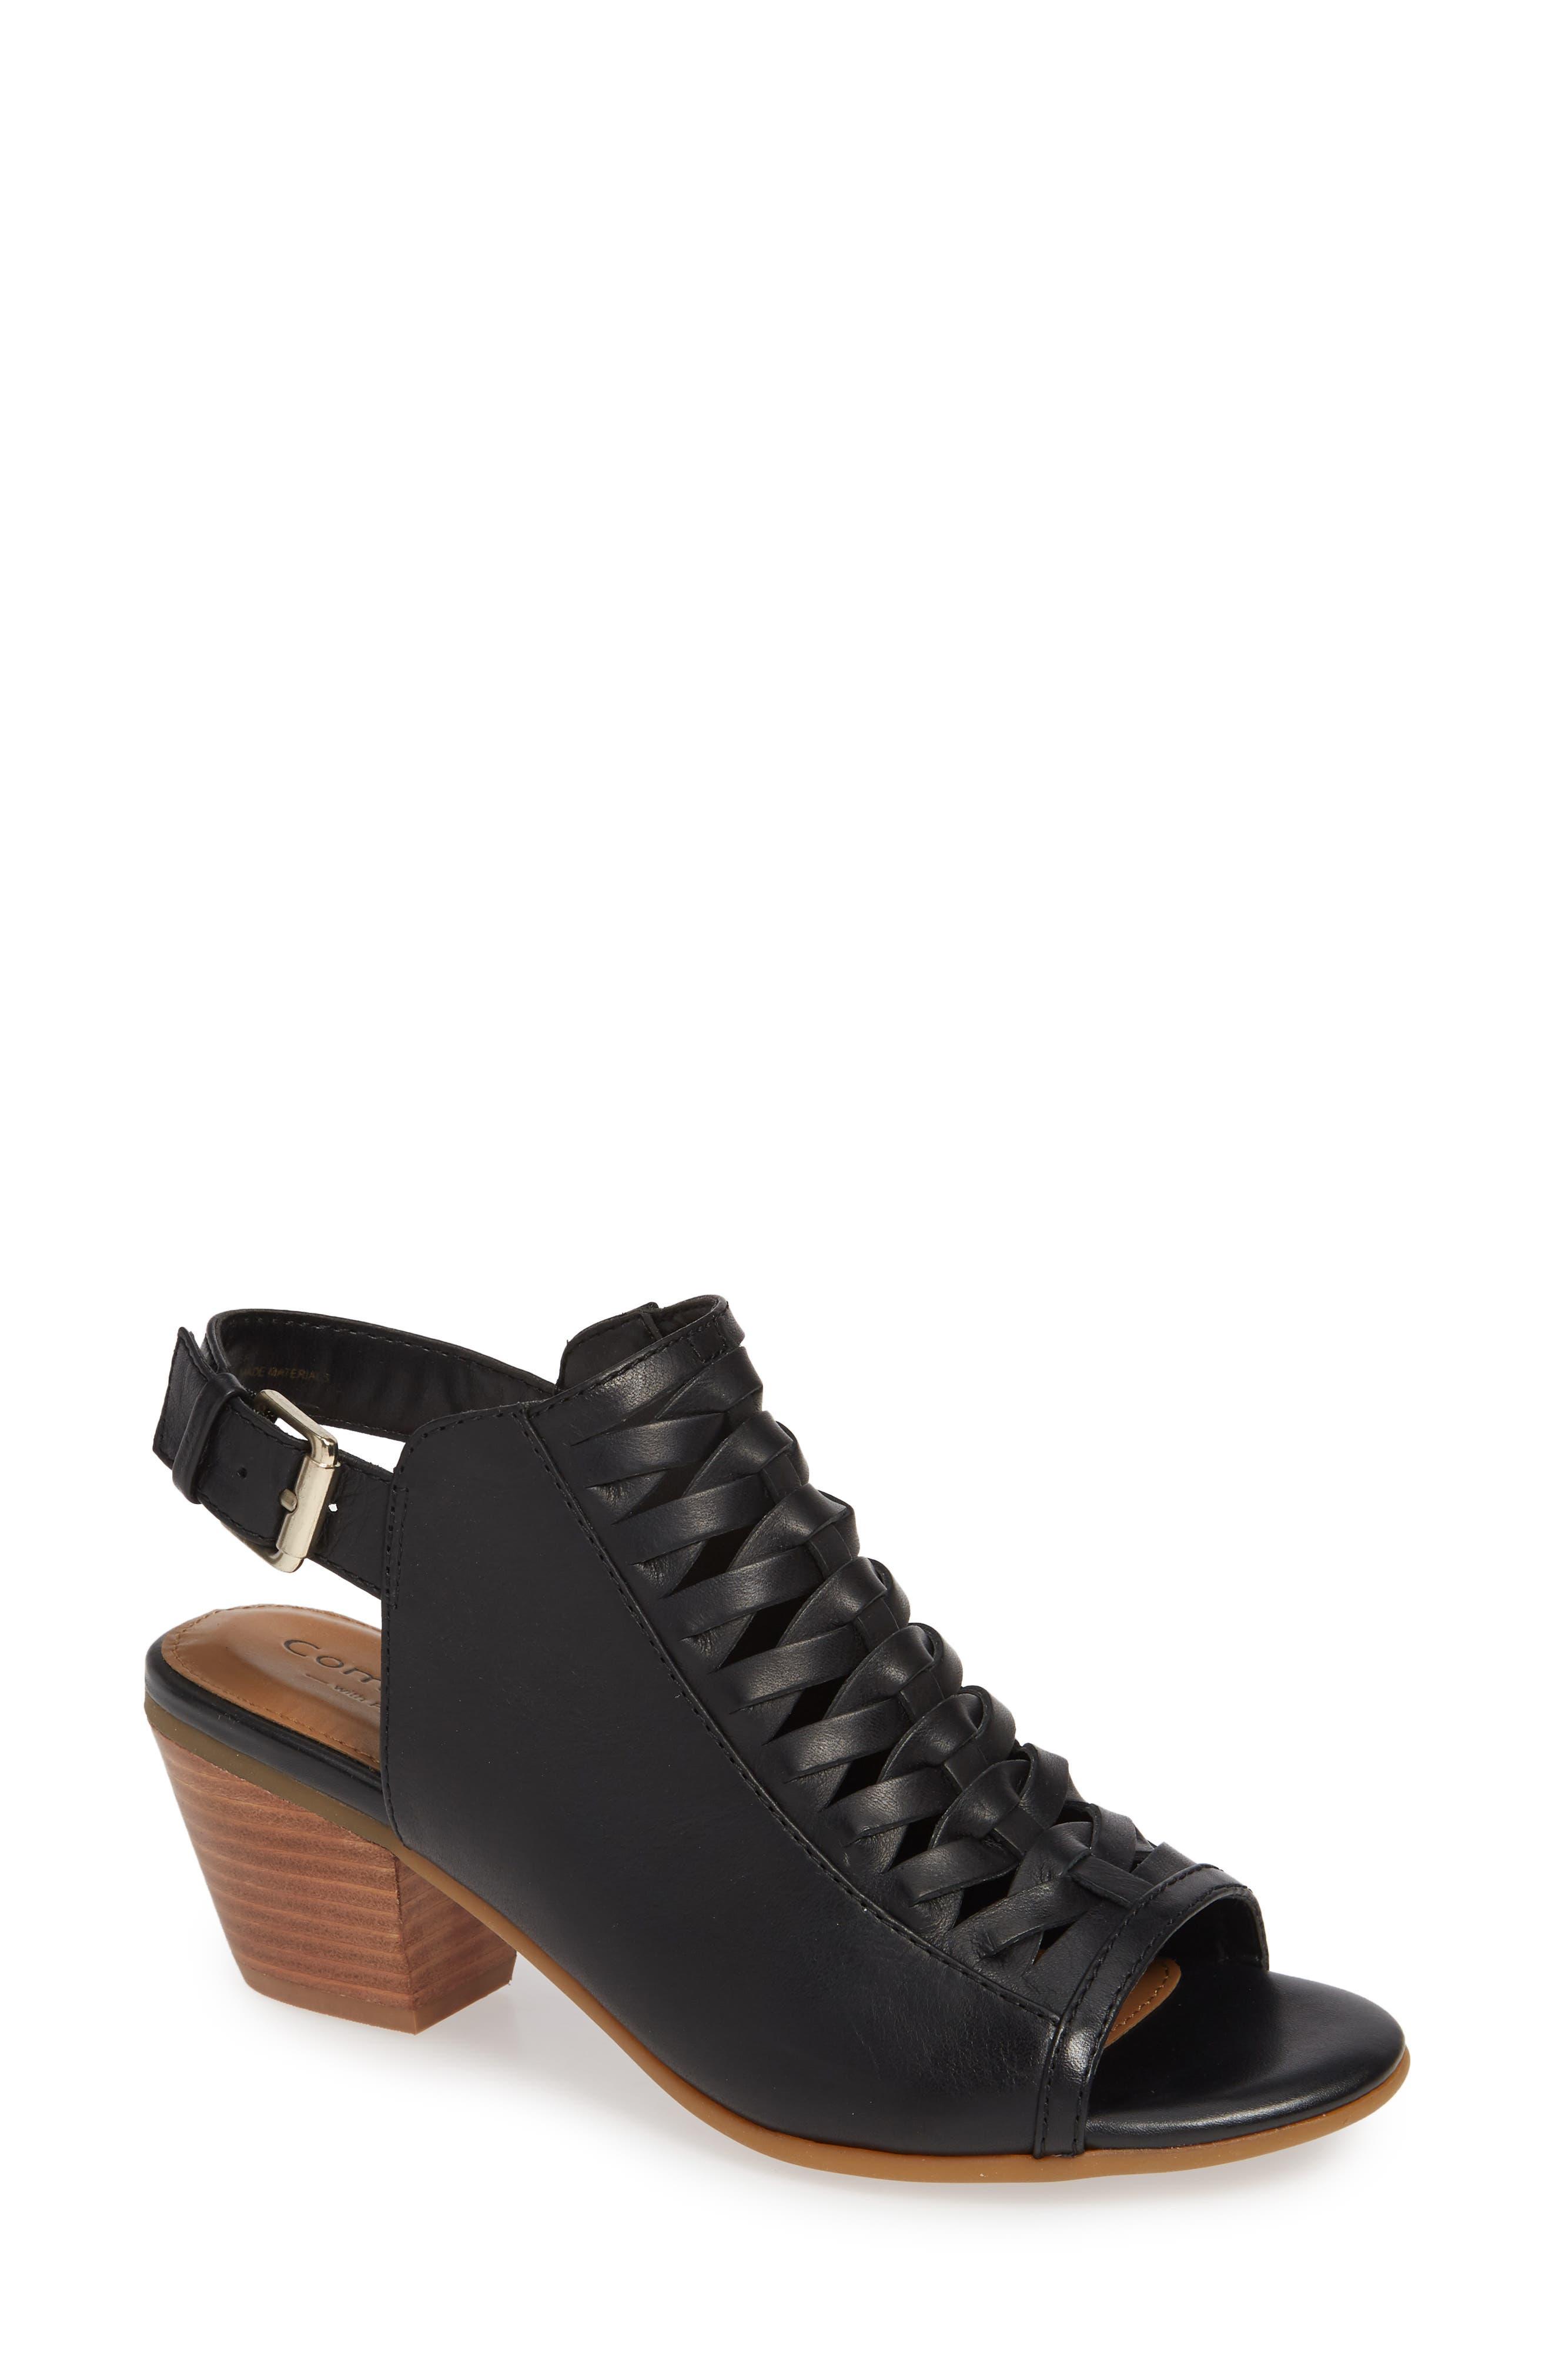 Comfortiva Alanna Leather Sandal- Black